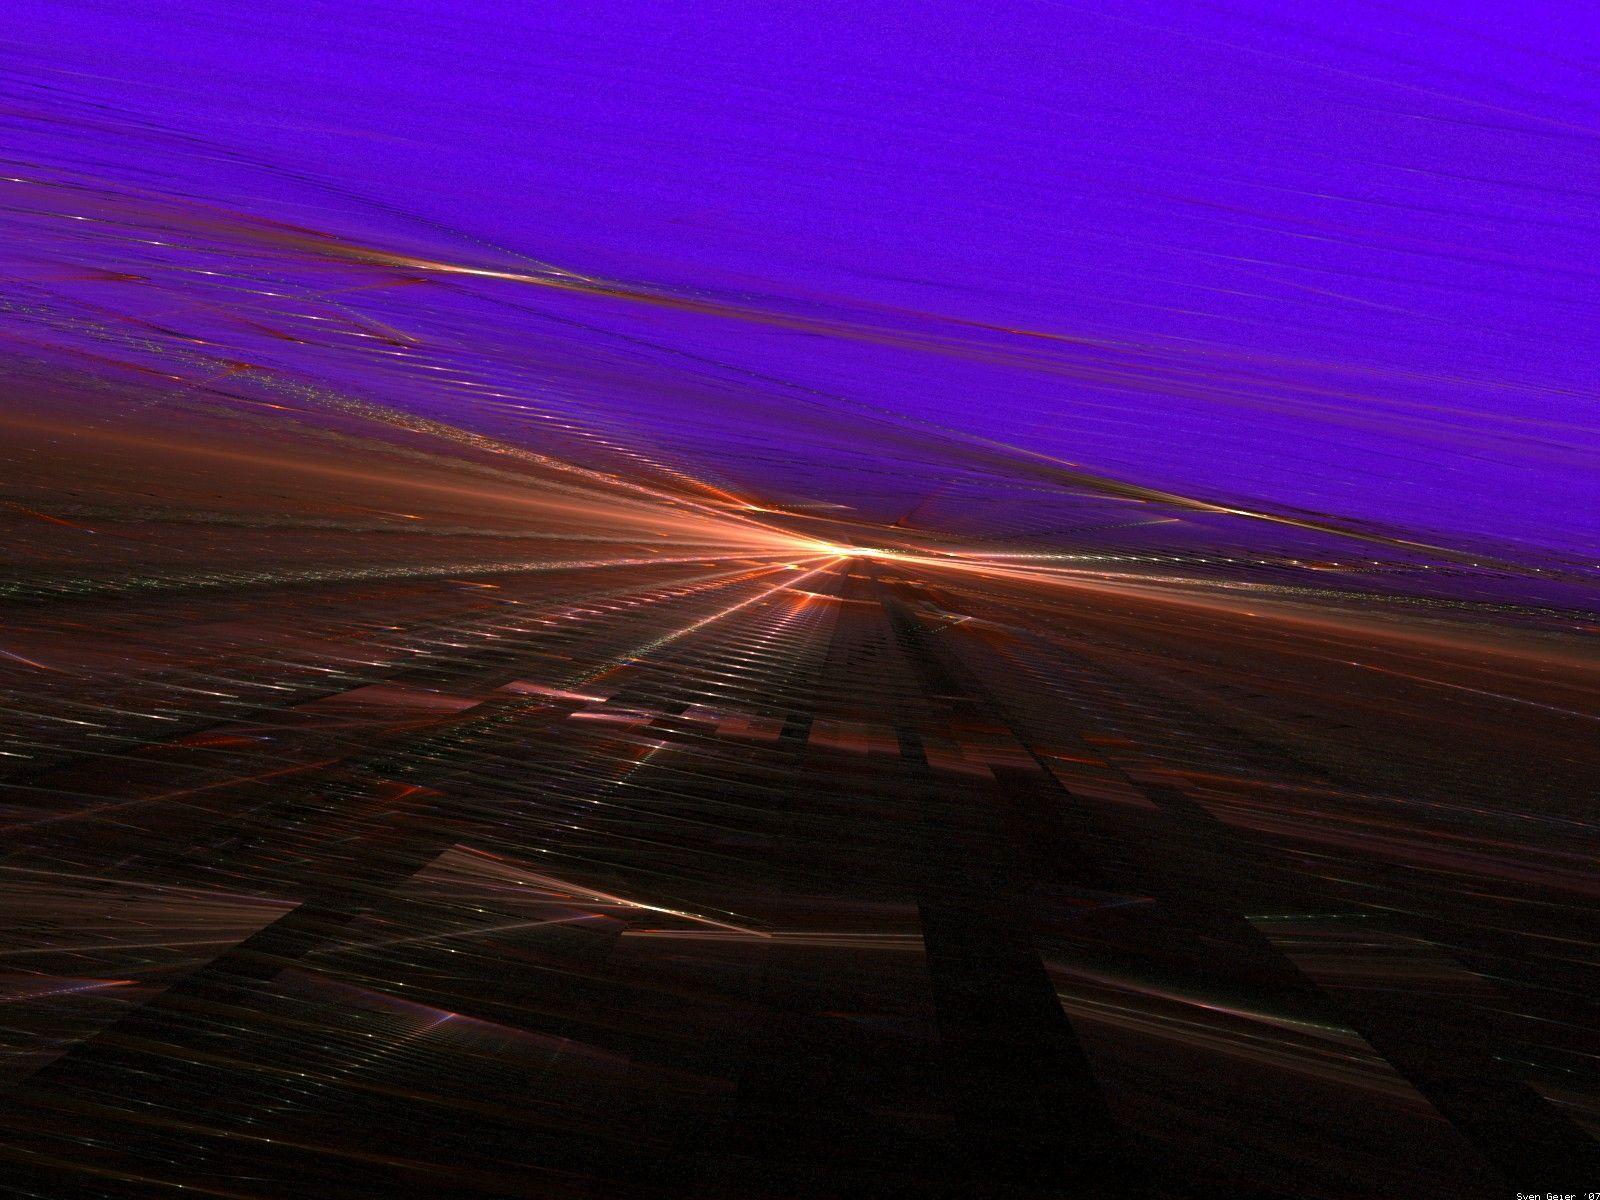 Sunset.jpg (1600×1200)